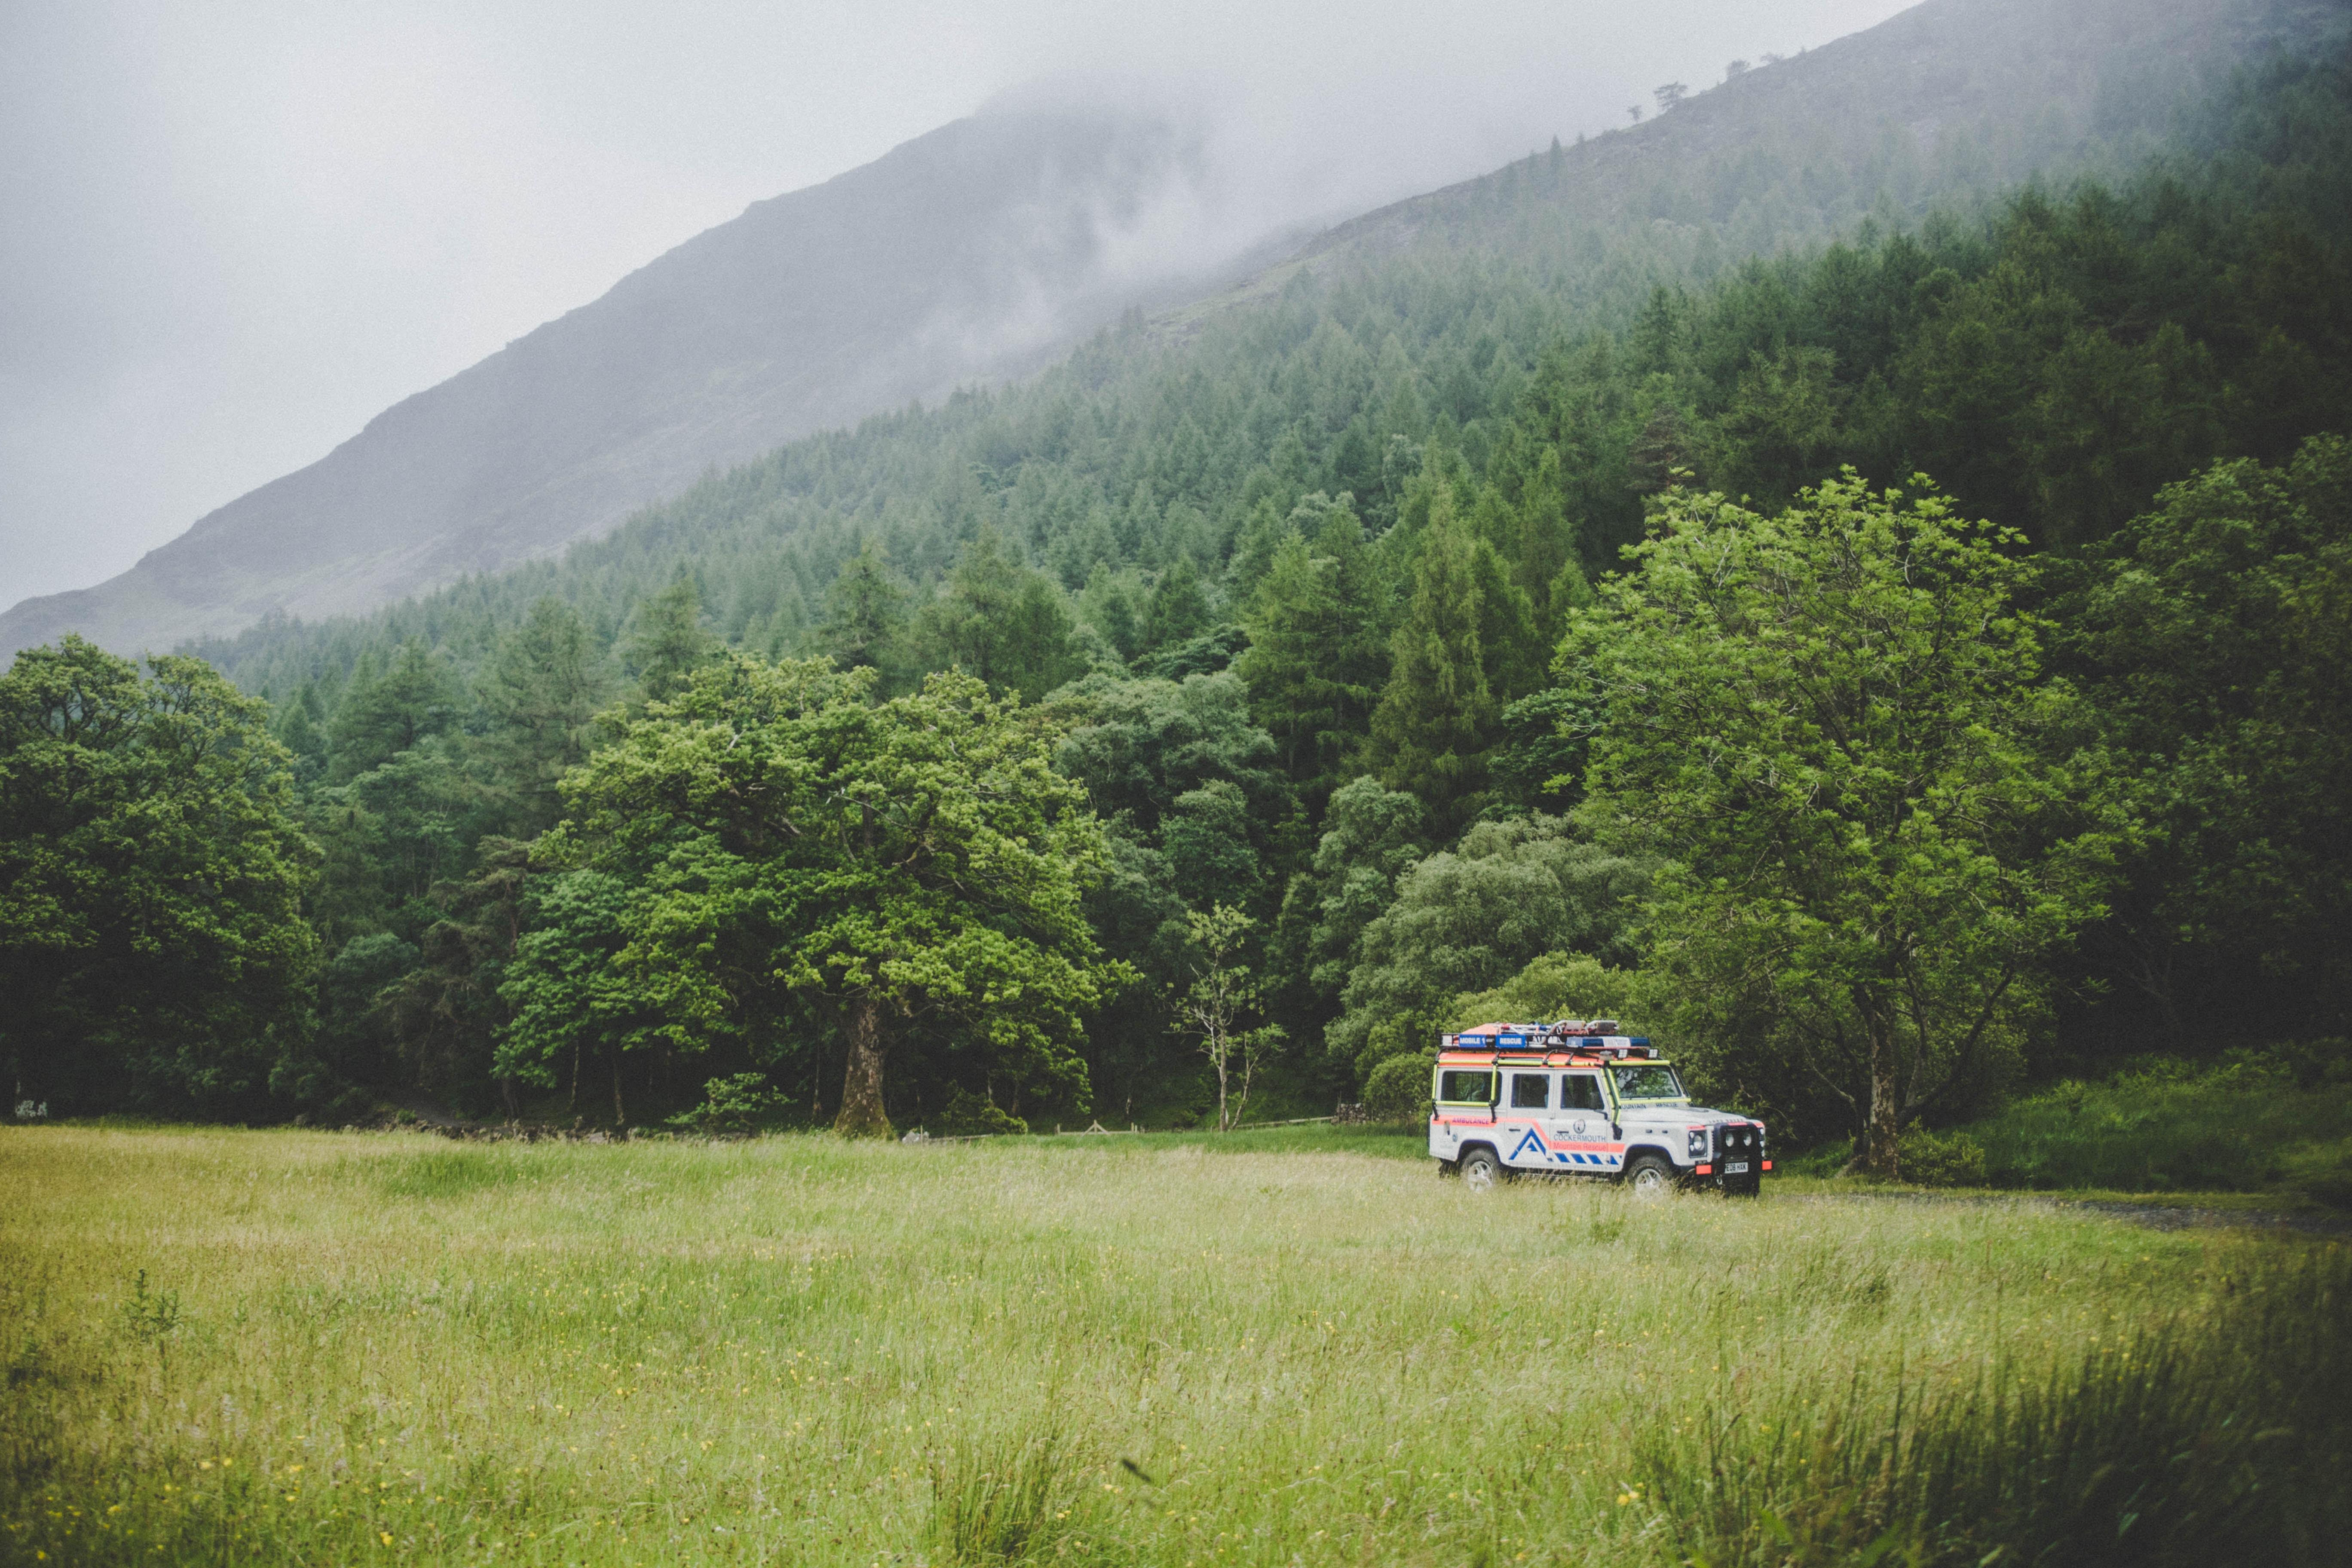 vehicle beside tree